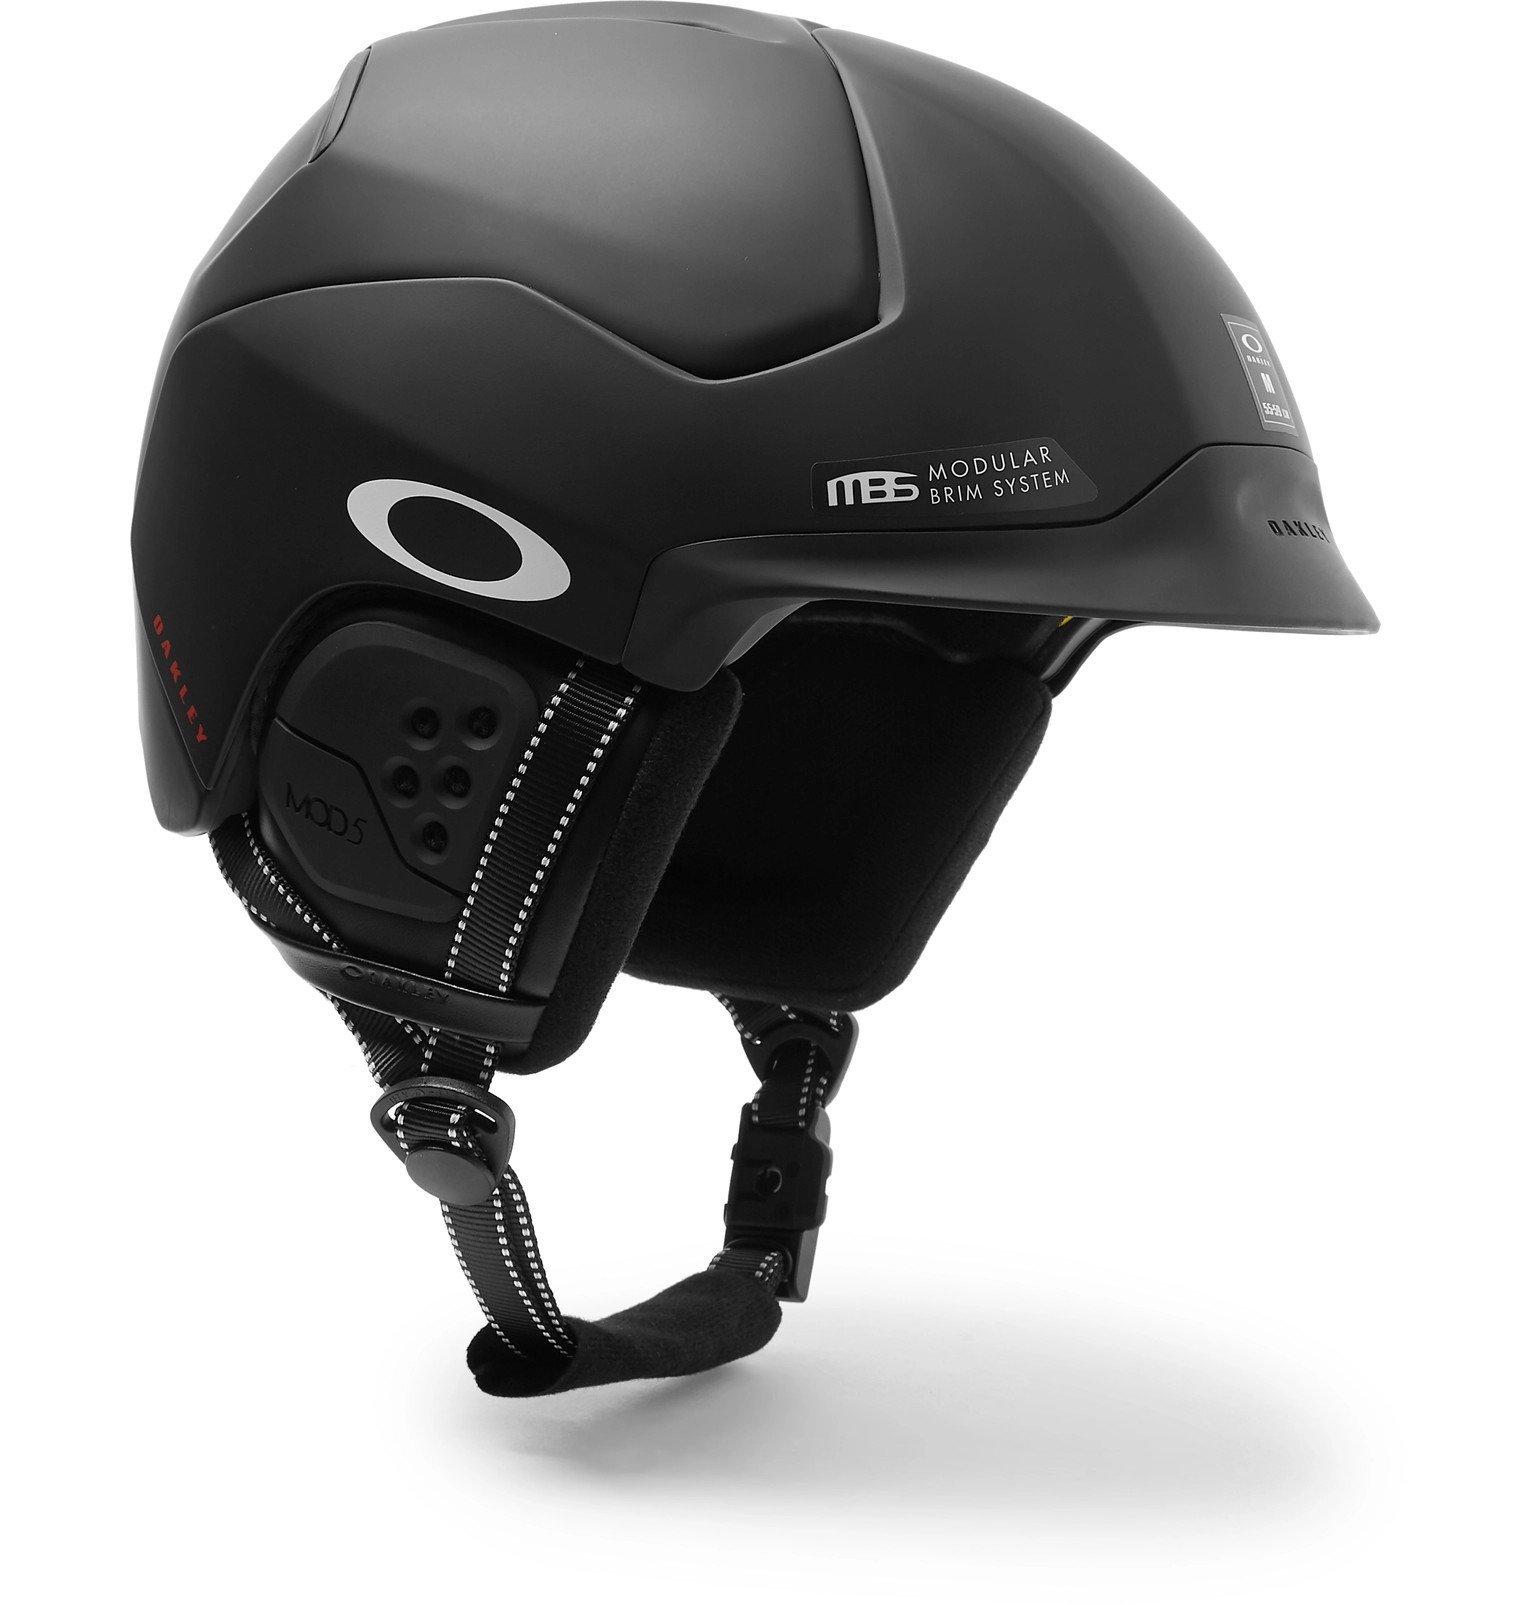 Photo: Oakley - Mod 5 Ski Helmet - Black